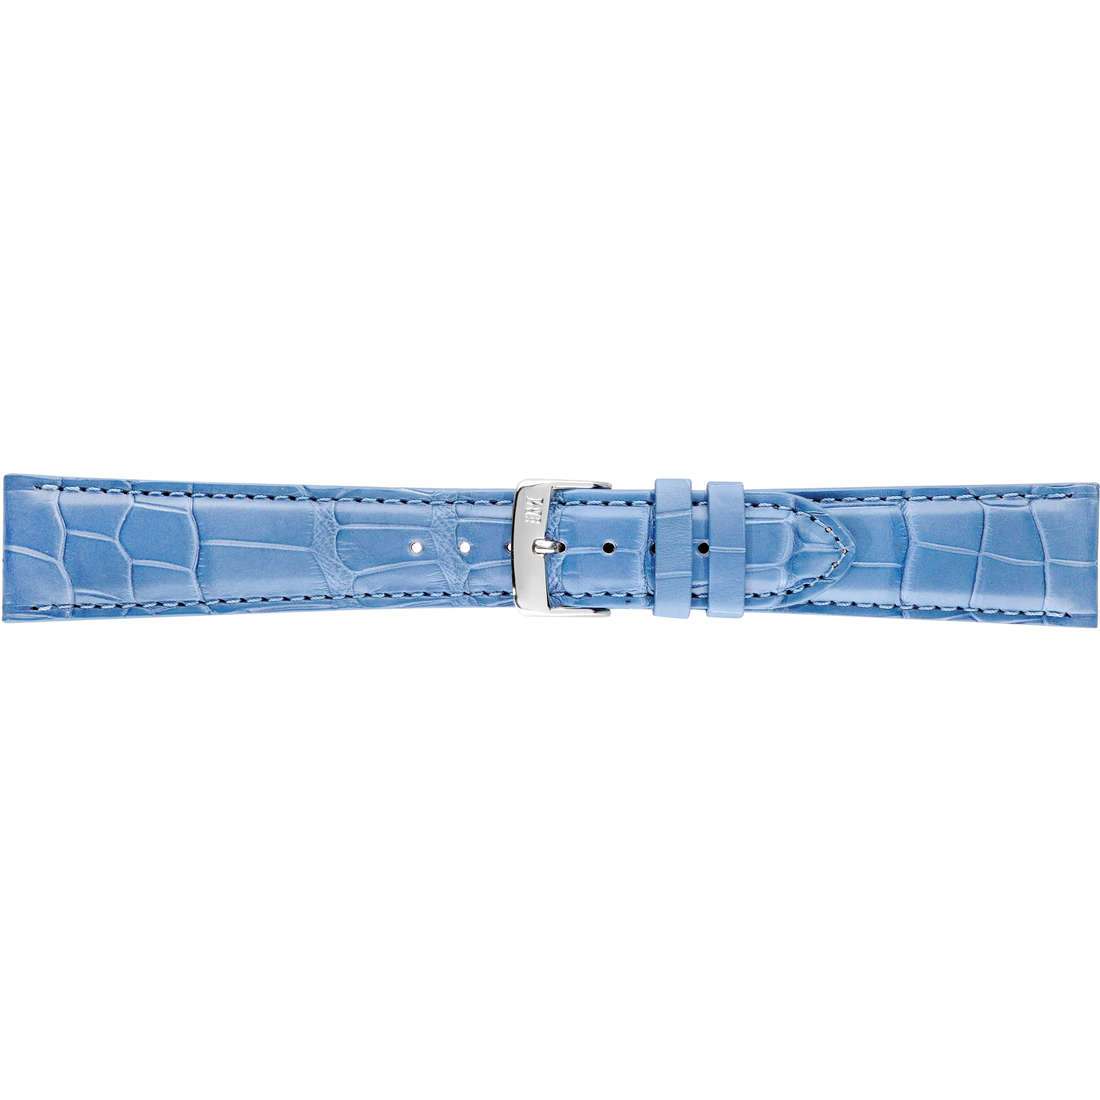 watch watch bands watch straps man Morellato Pelli Preziose A01U0518339266CR18